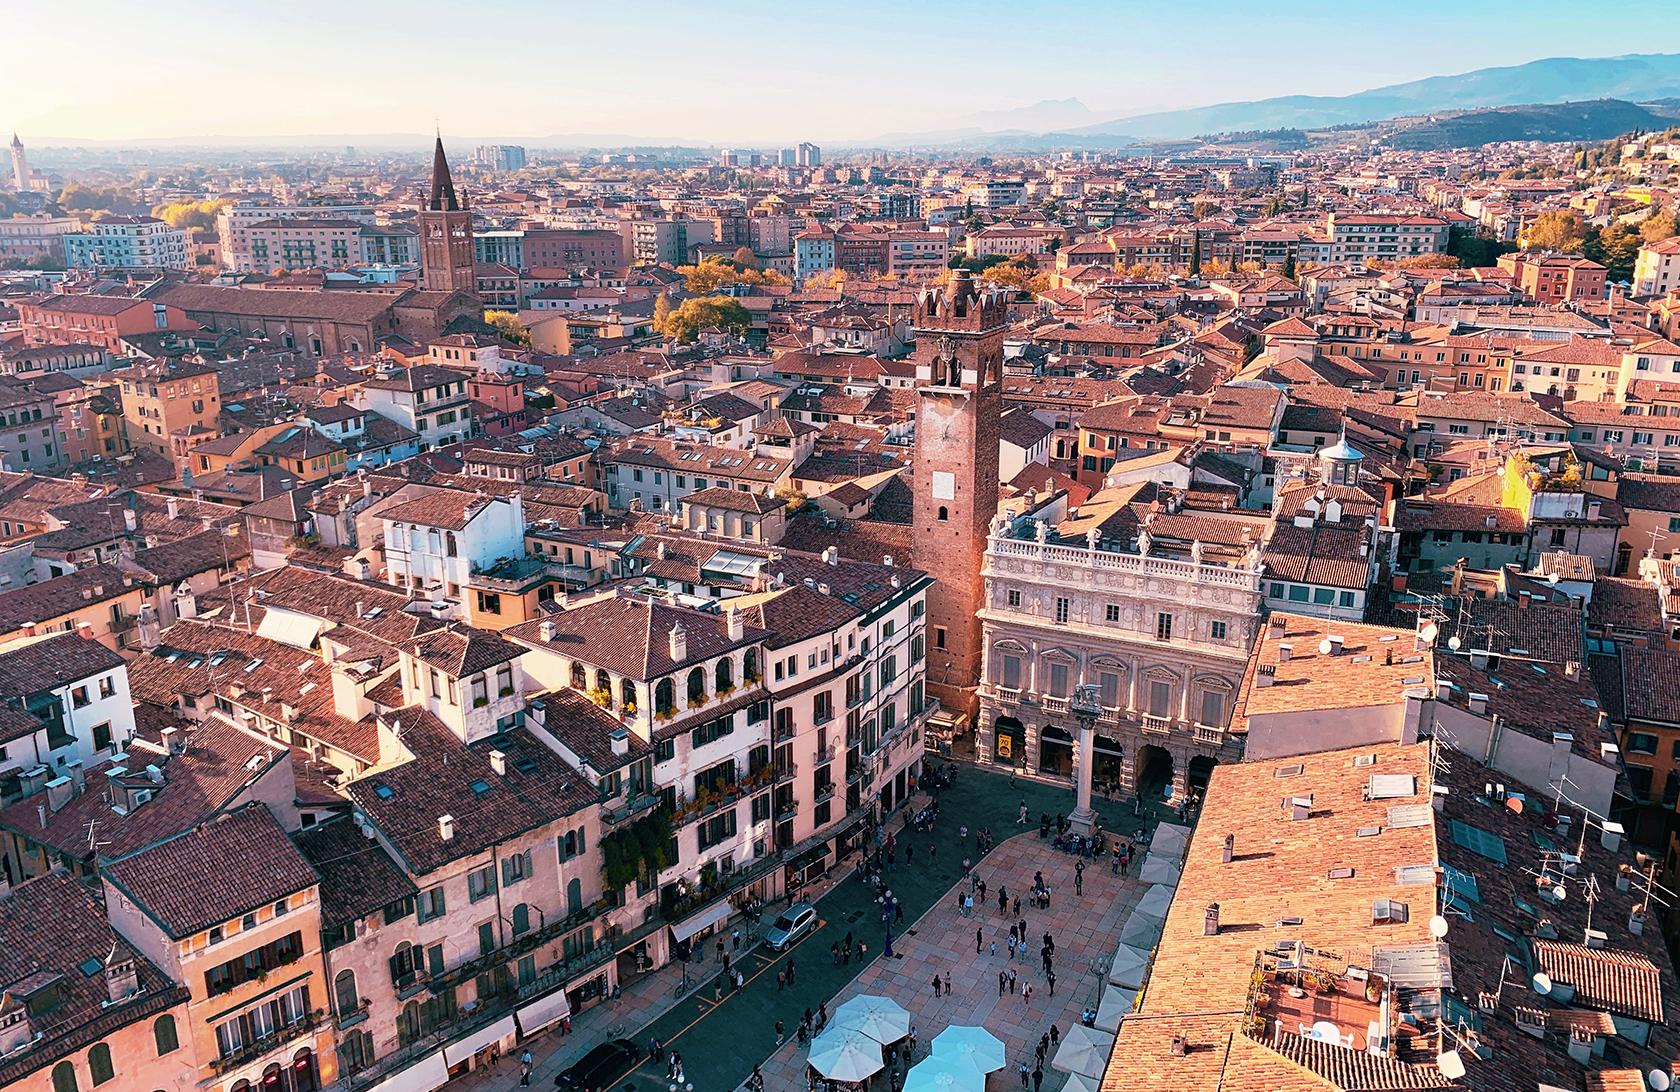 Charming Verona piazza